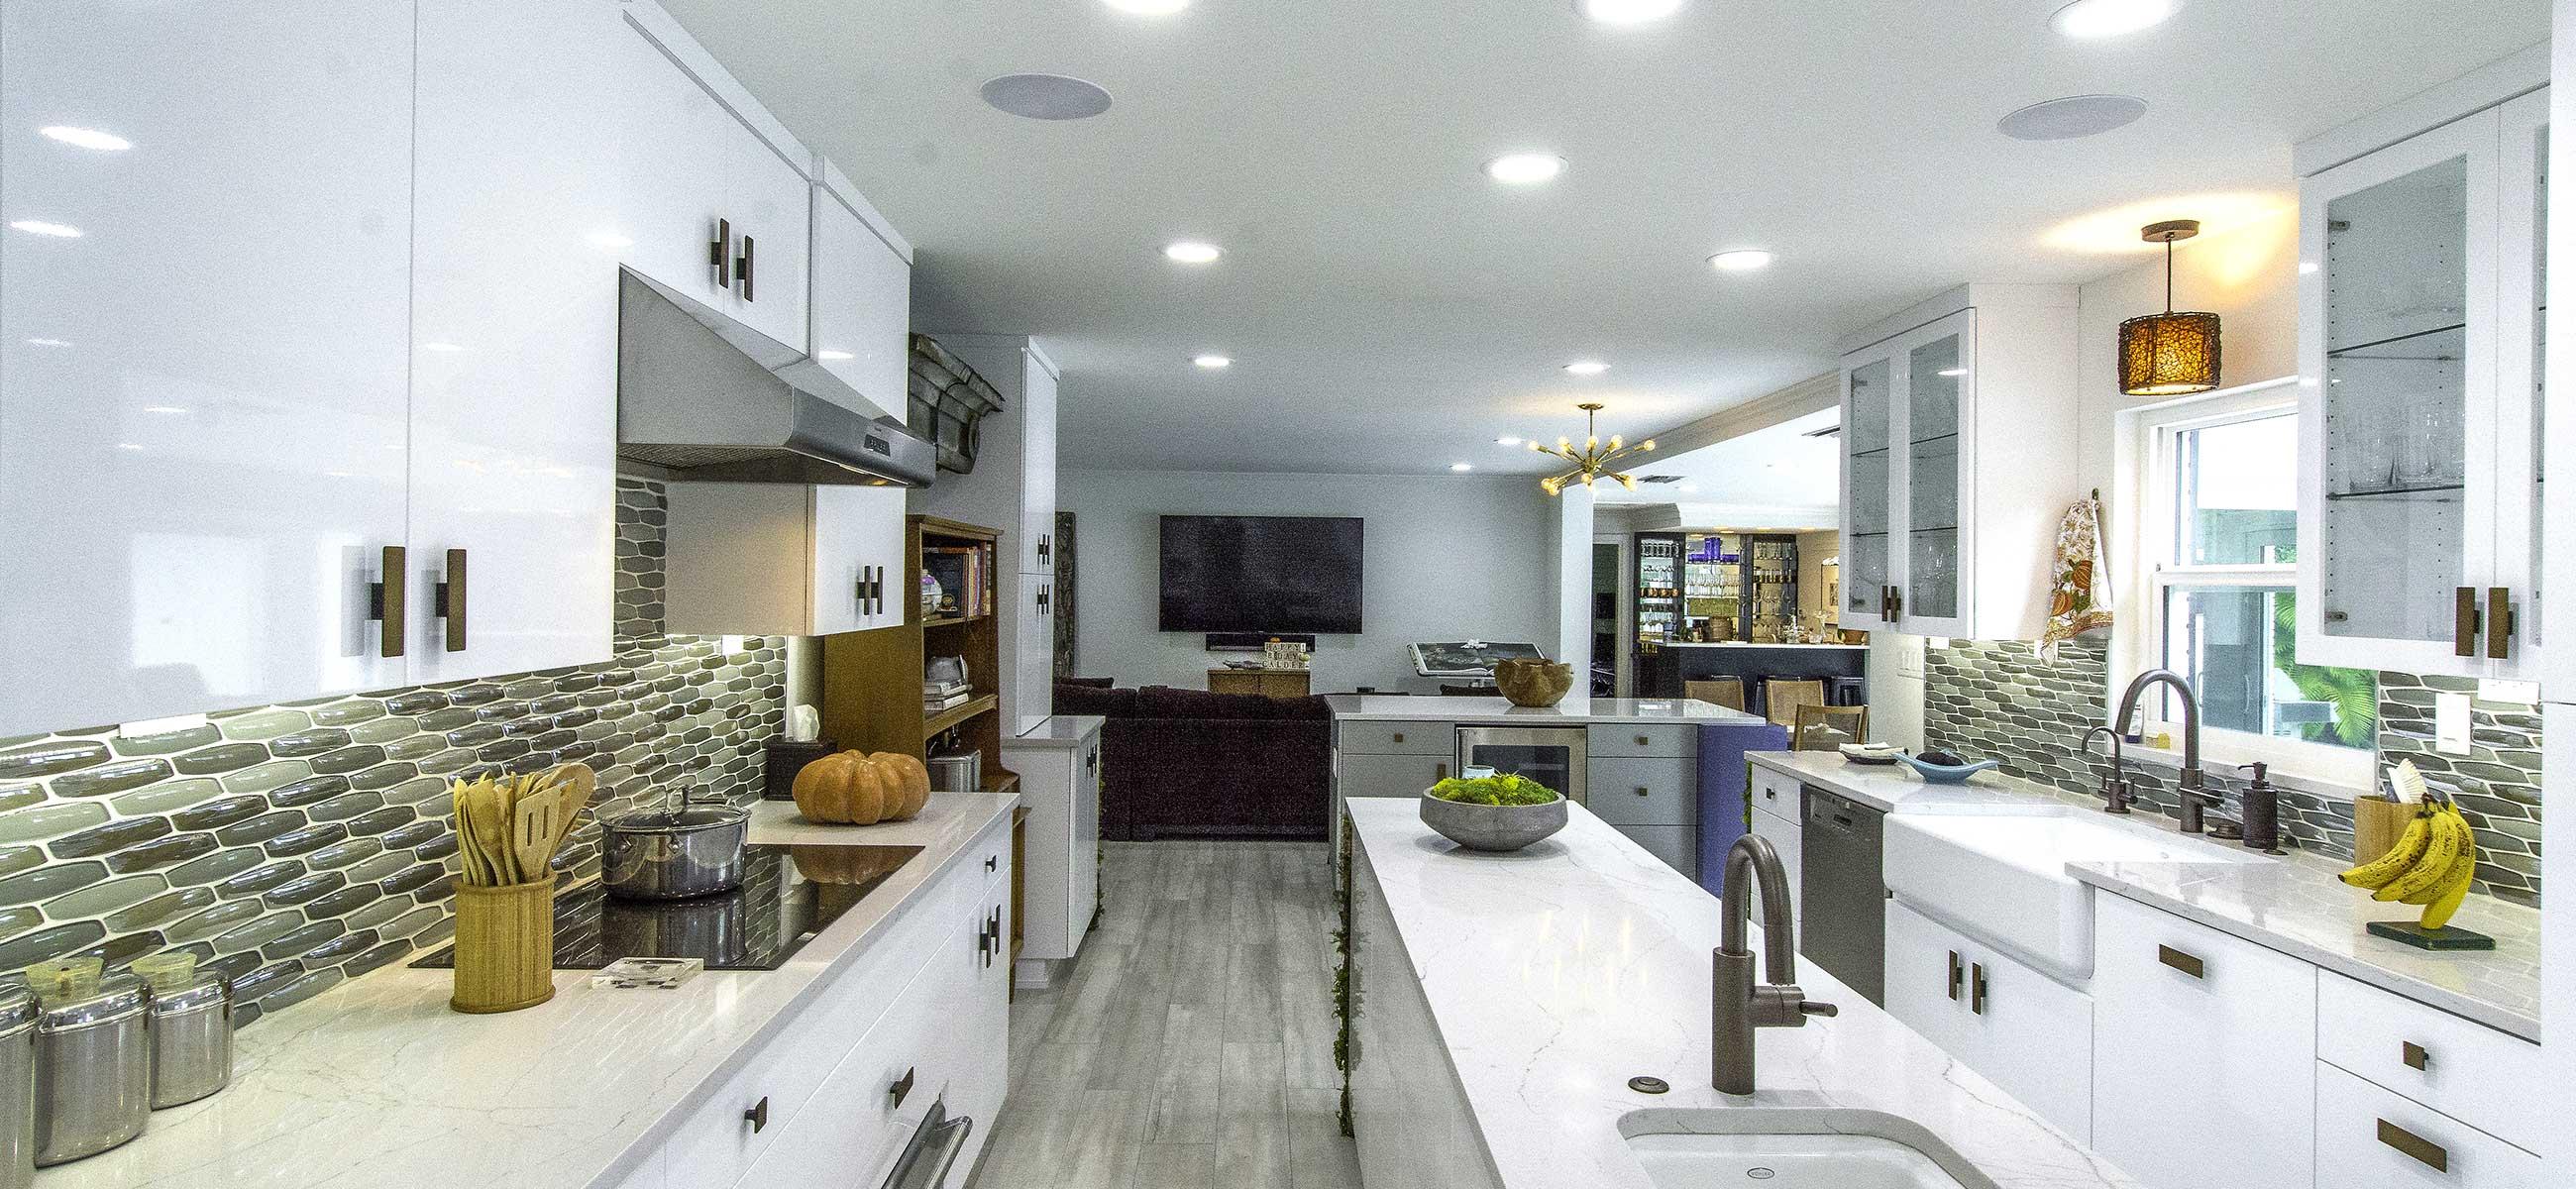 About Tampa Bay Interior Designer Johanna Seldes ASID : Interior Design  Consulting